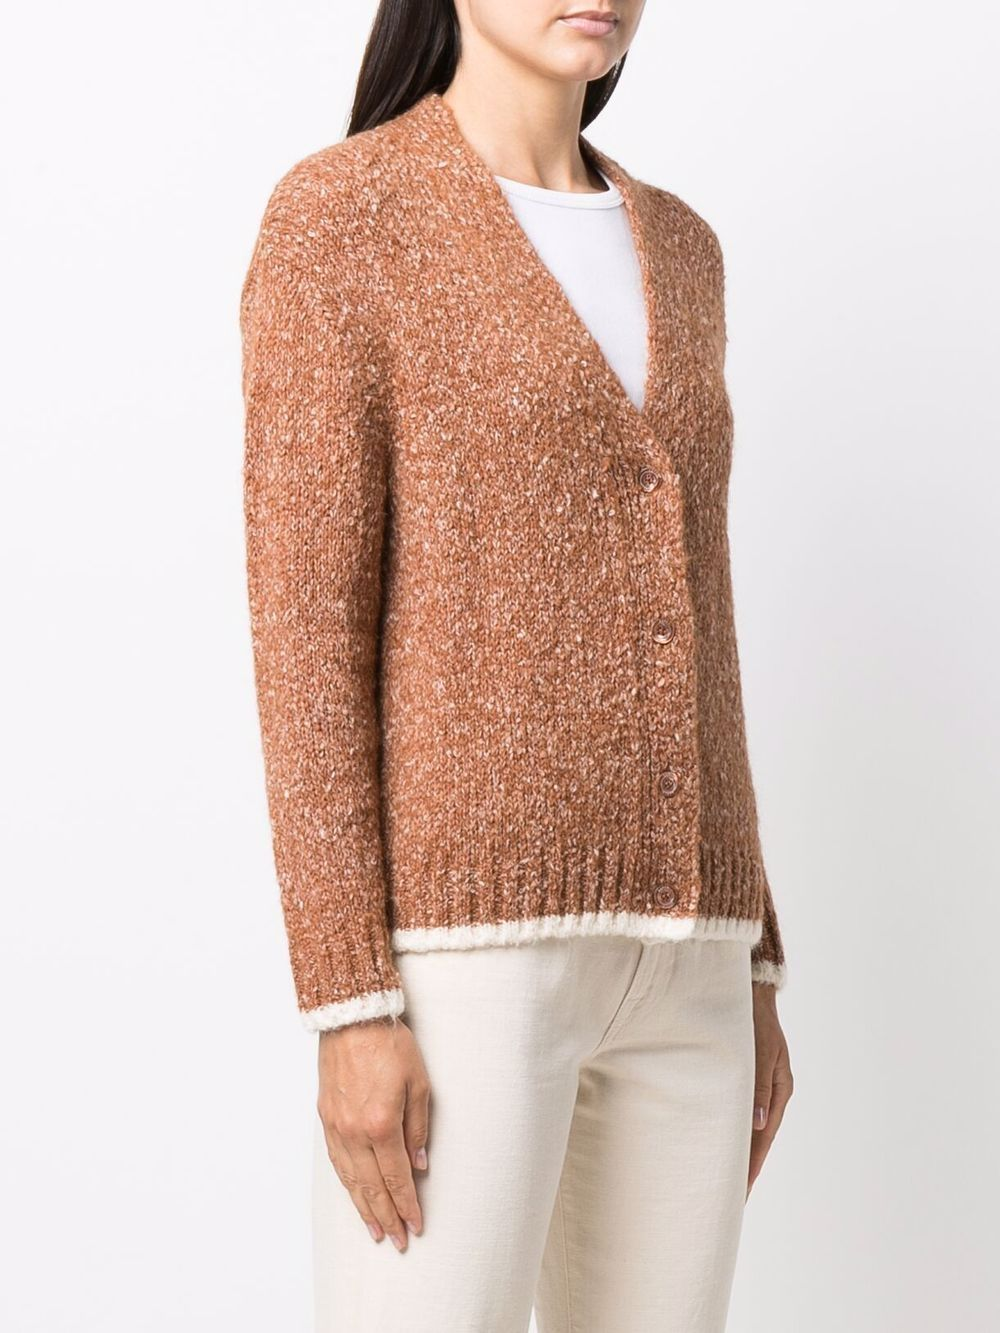 Brown alpaca wool and cotton button-down knit cardigan  ASPESI |  | 5096-406501224